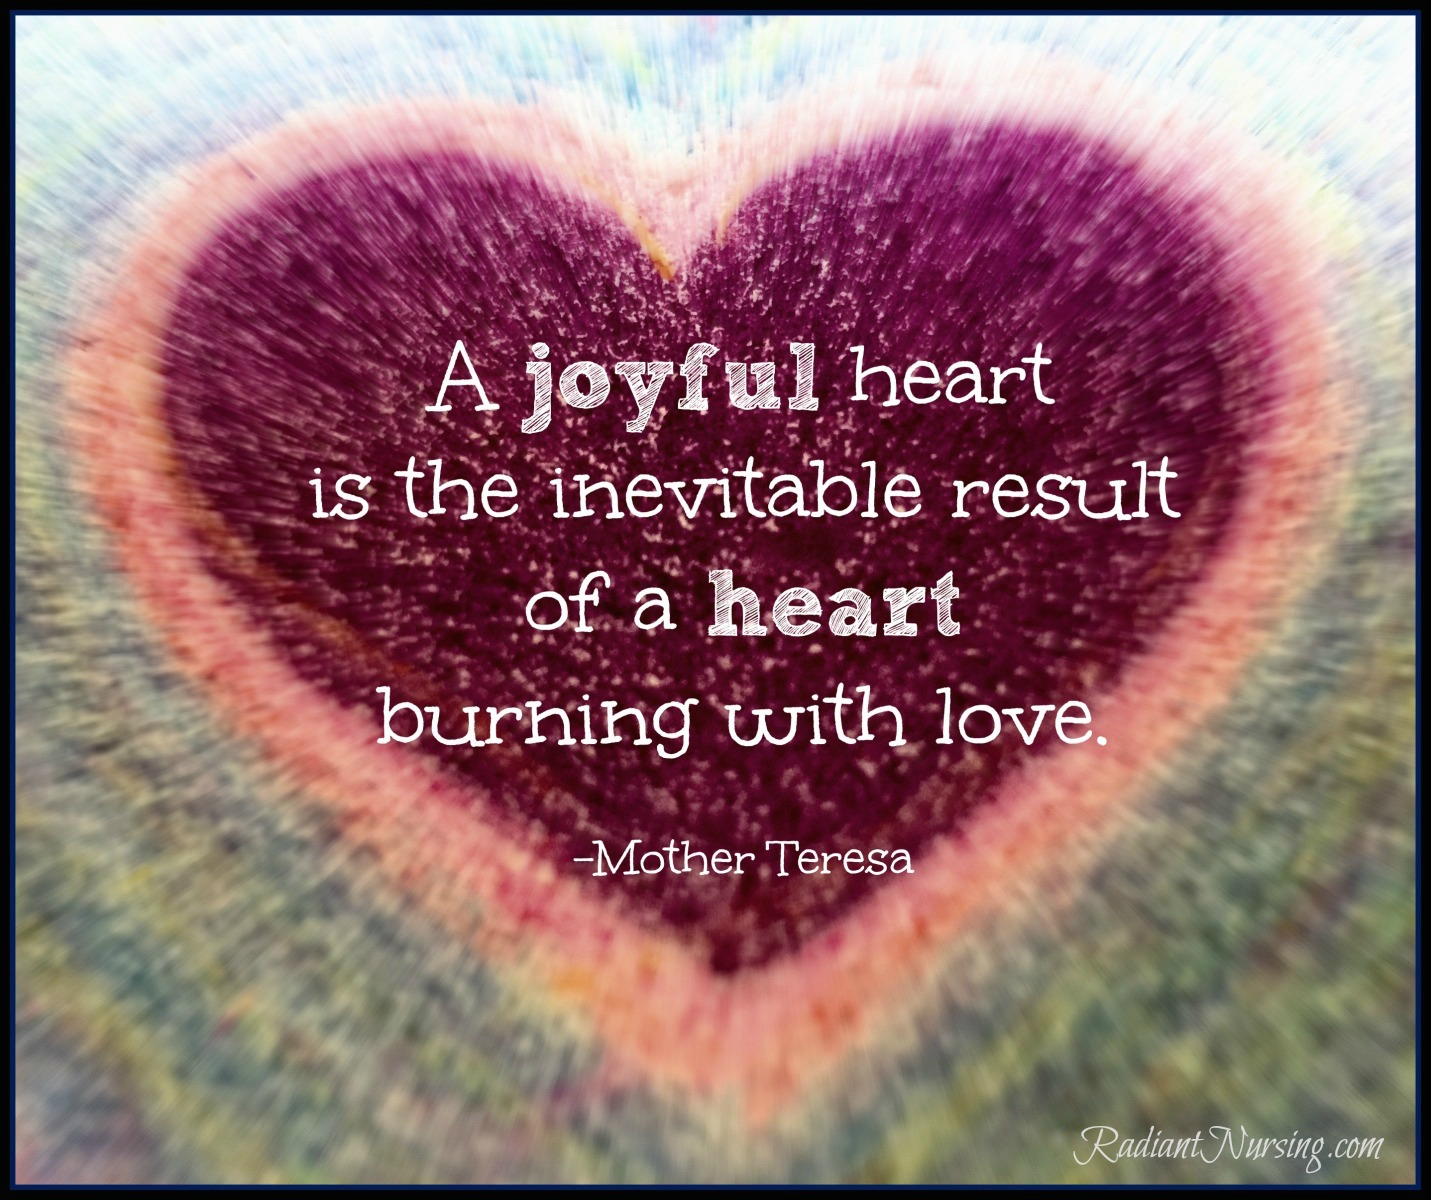 A joyful heart...